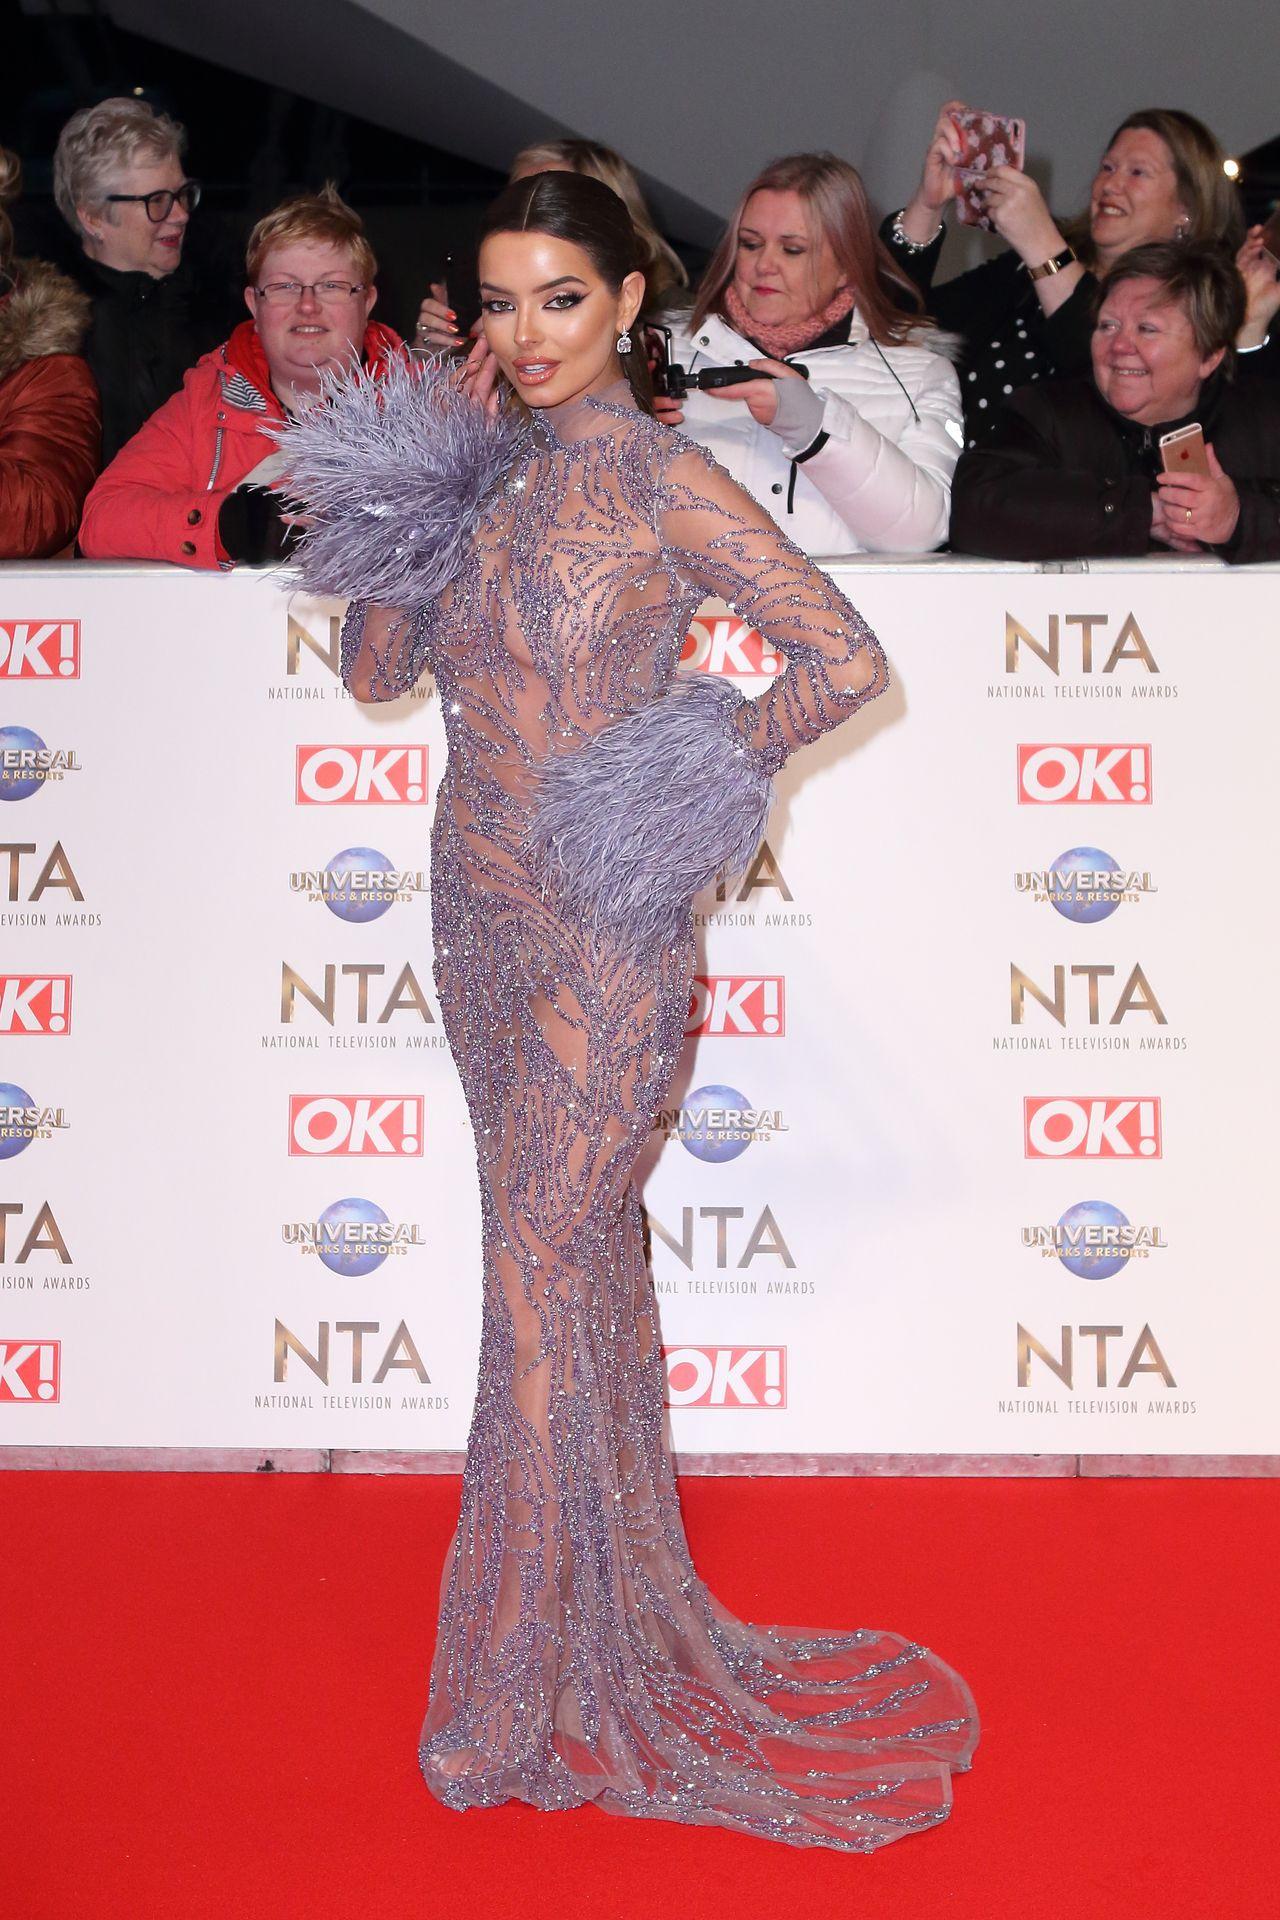 Maura Higgins Looks Hot At The National Television Awards 0014